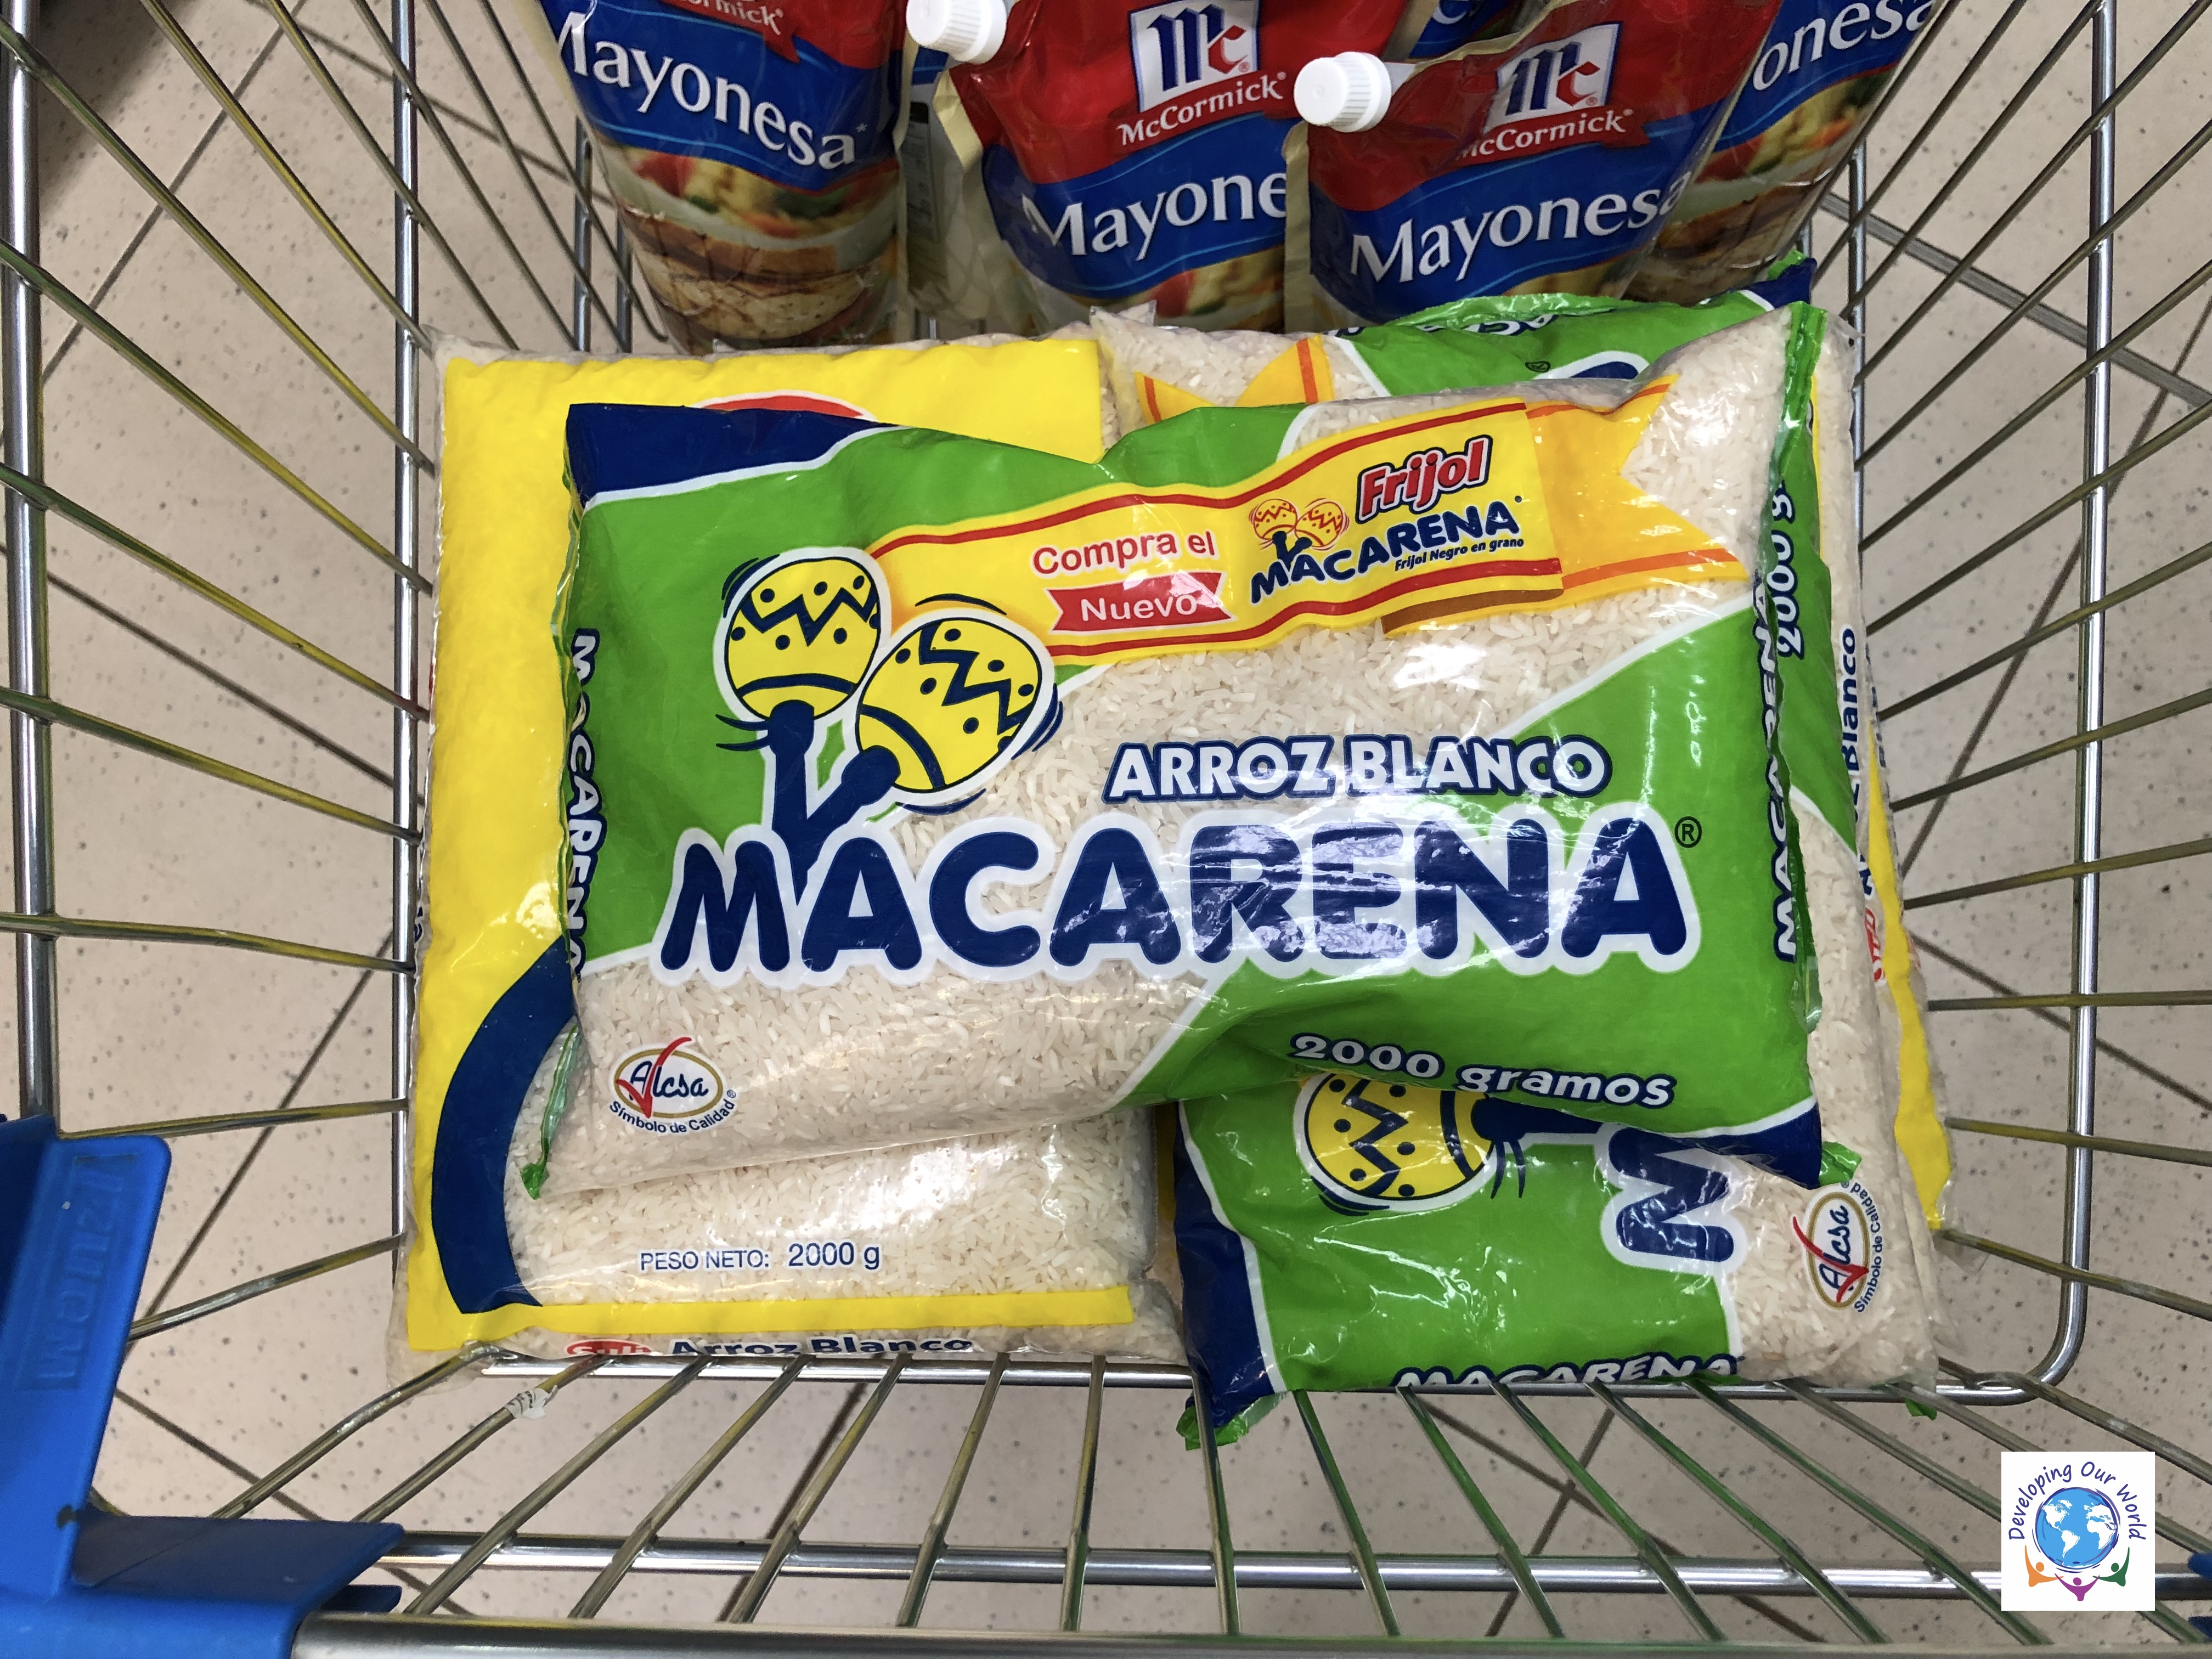 44 lbs of rice